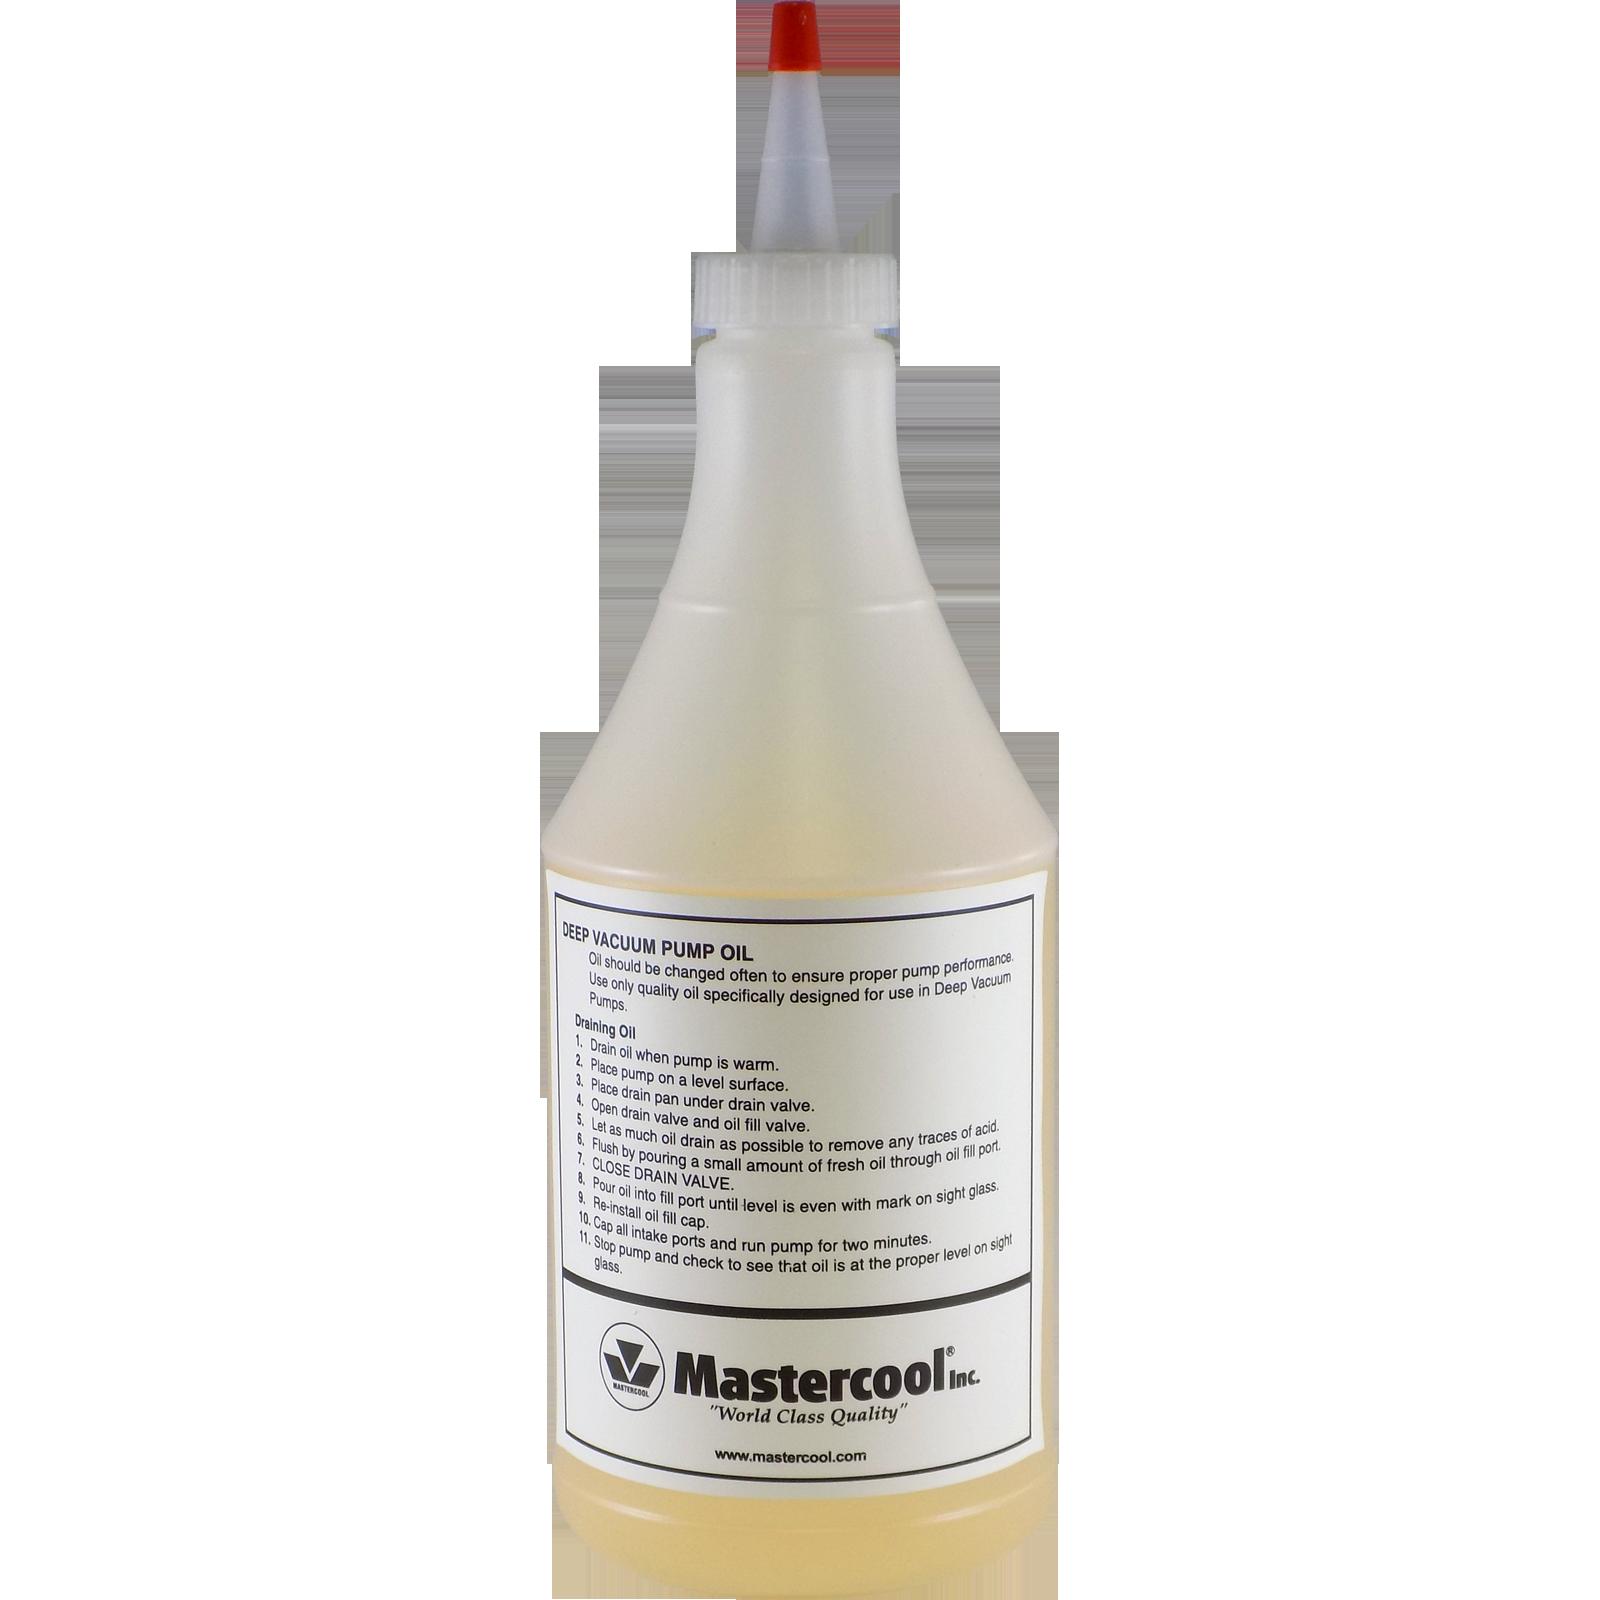 Vacuum Pump Oil - Bramec Corporation - Wholesale Distributer of